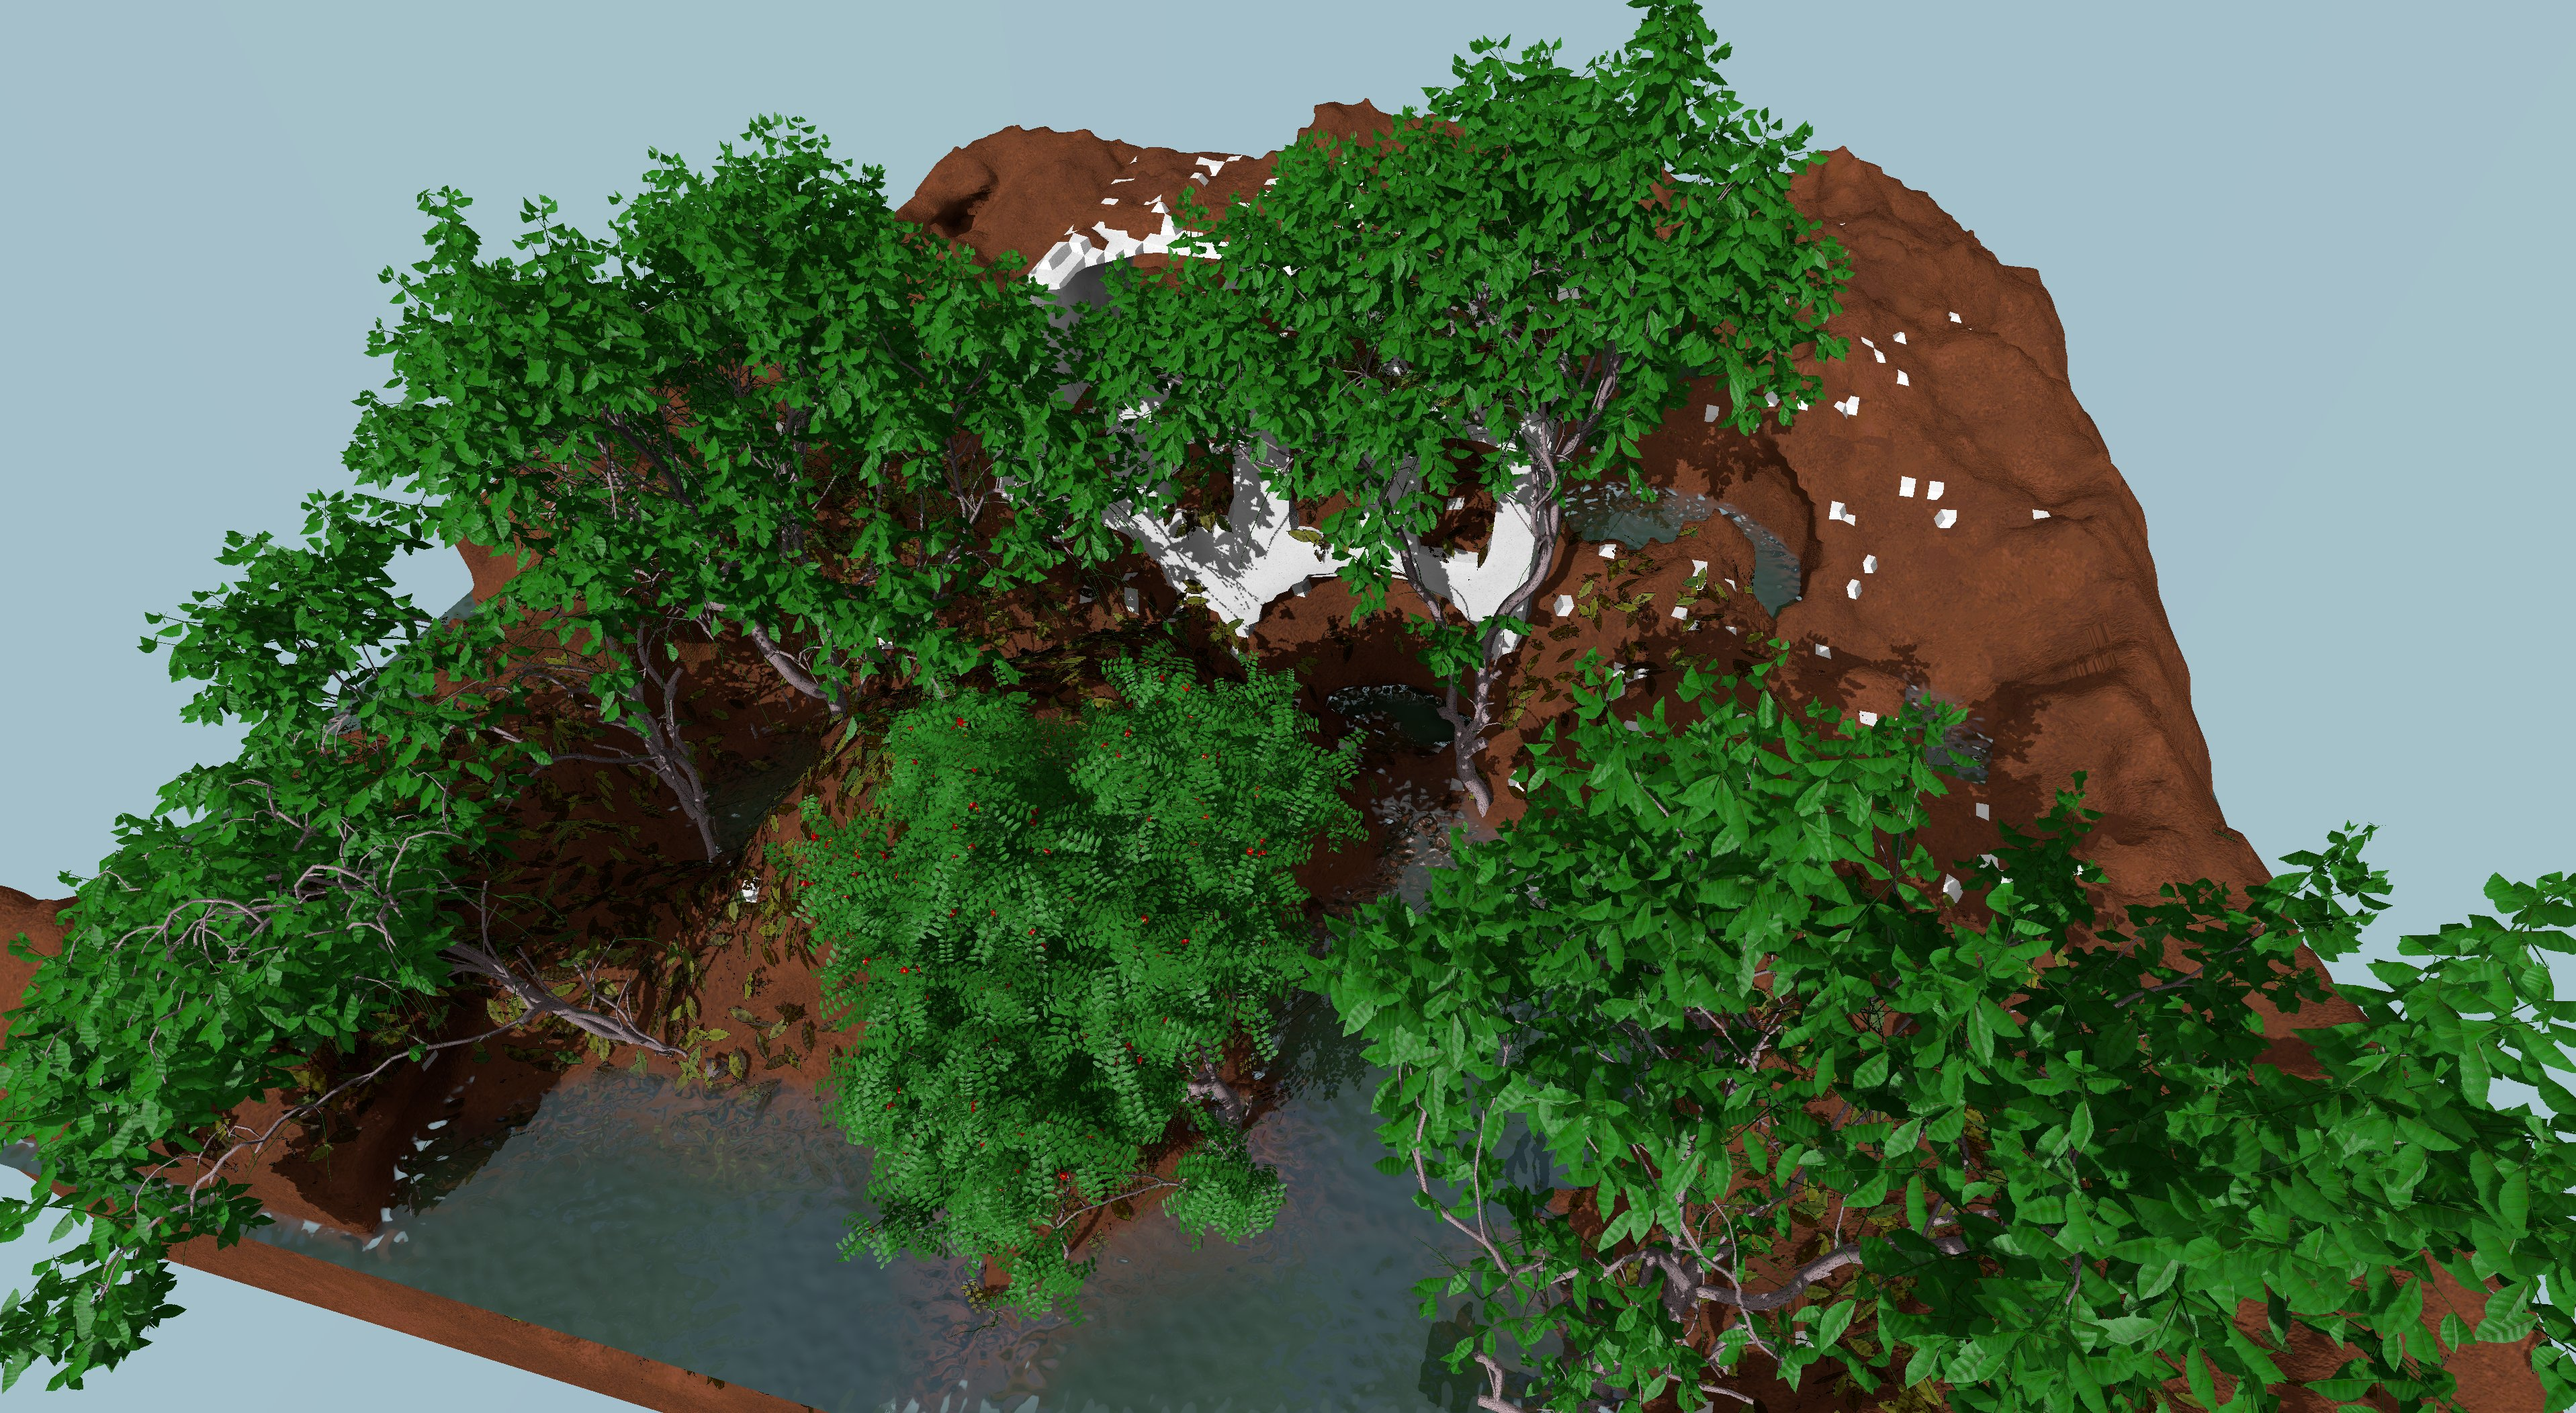 Garden screenshot: ruins, trees and water in craters